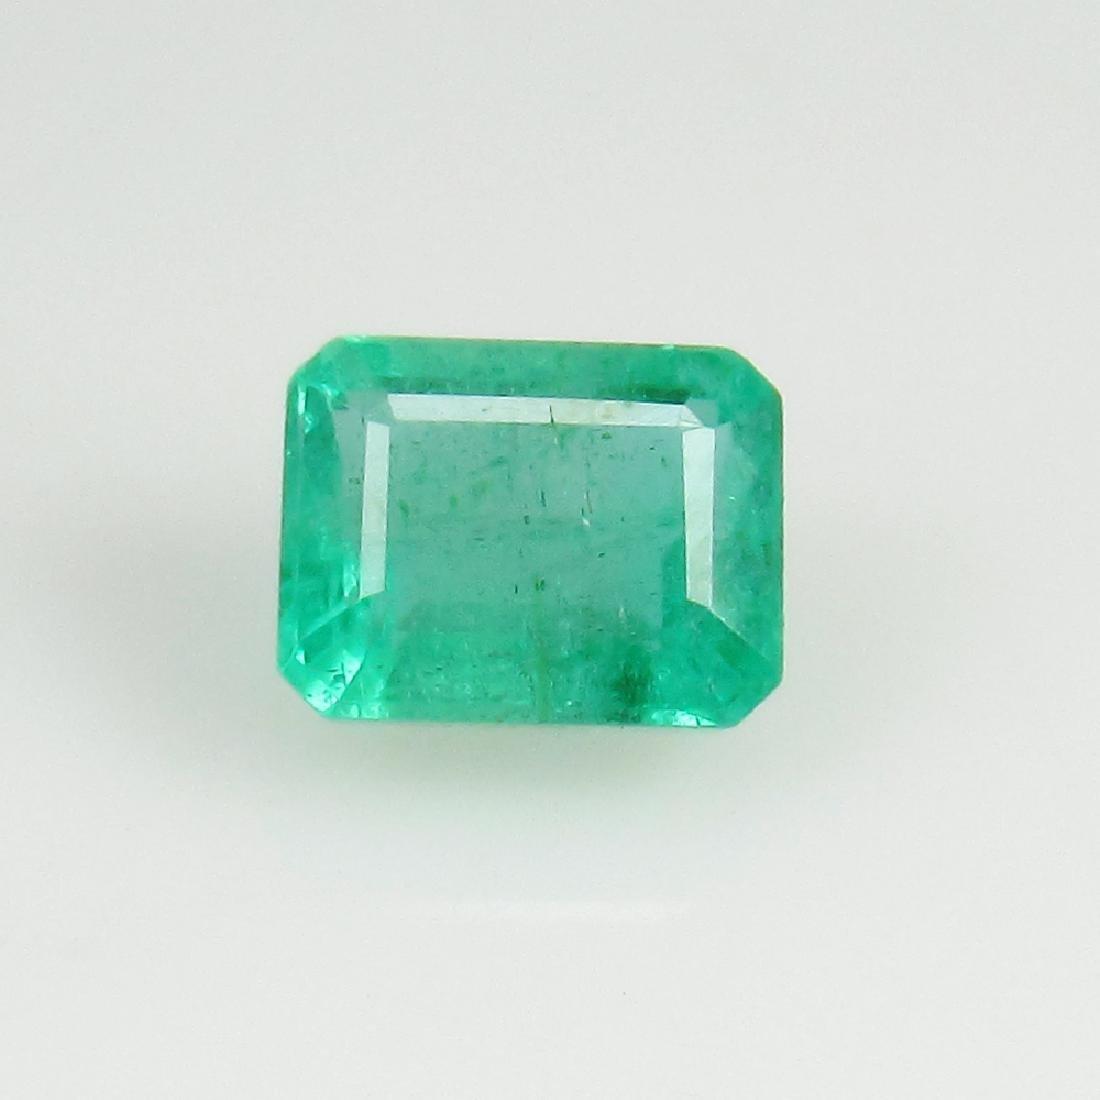 IGI Certified 0.74 Ct Genuine Zambian Emerald Very Good